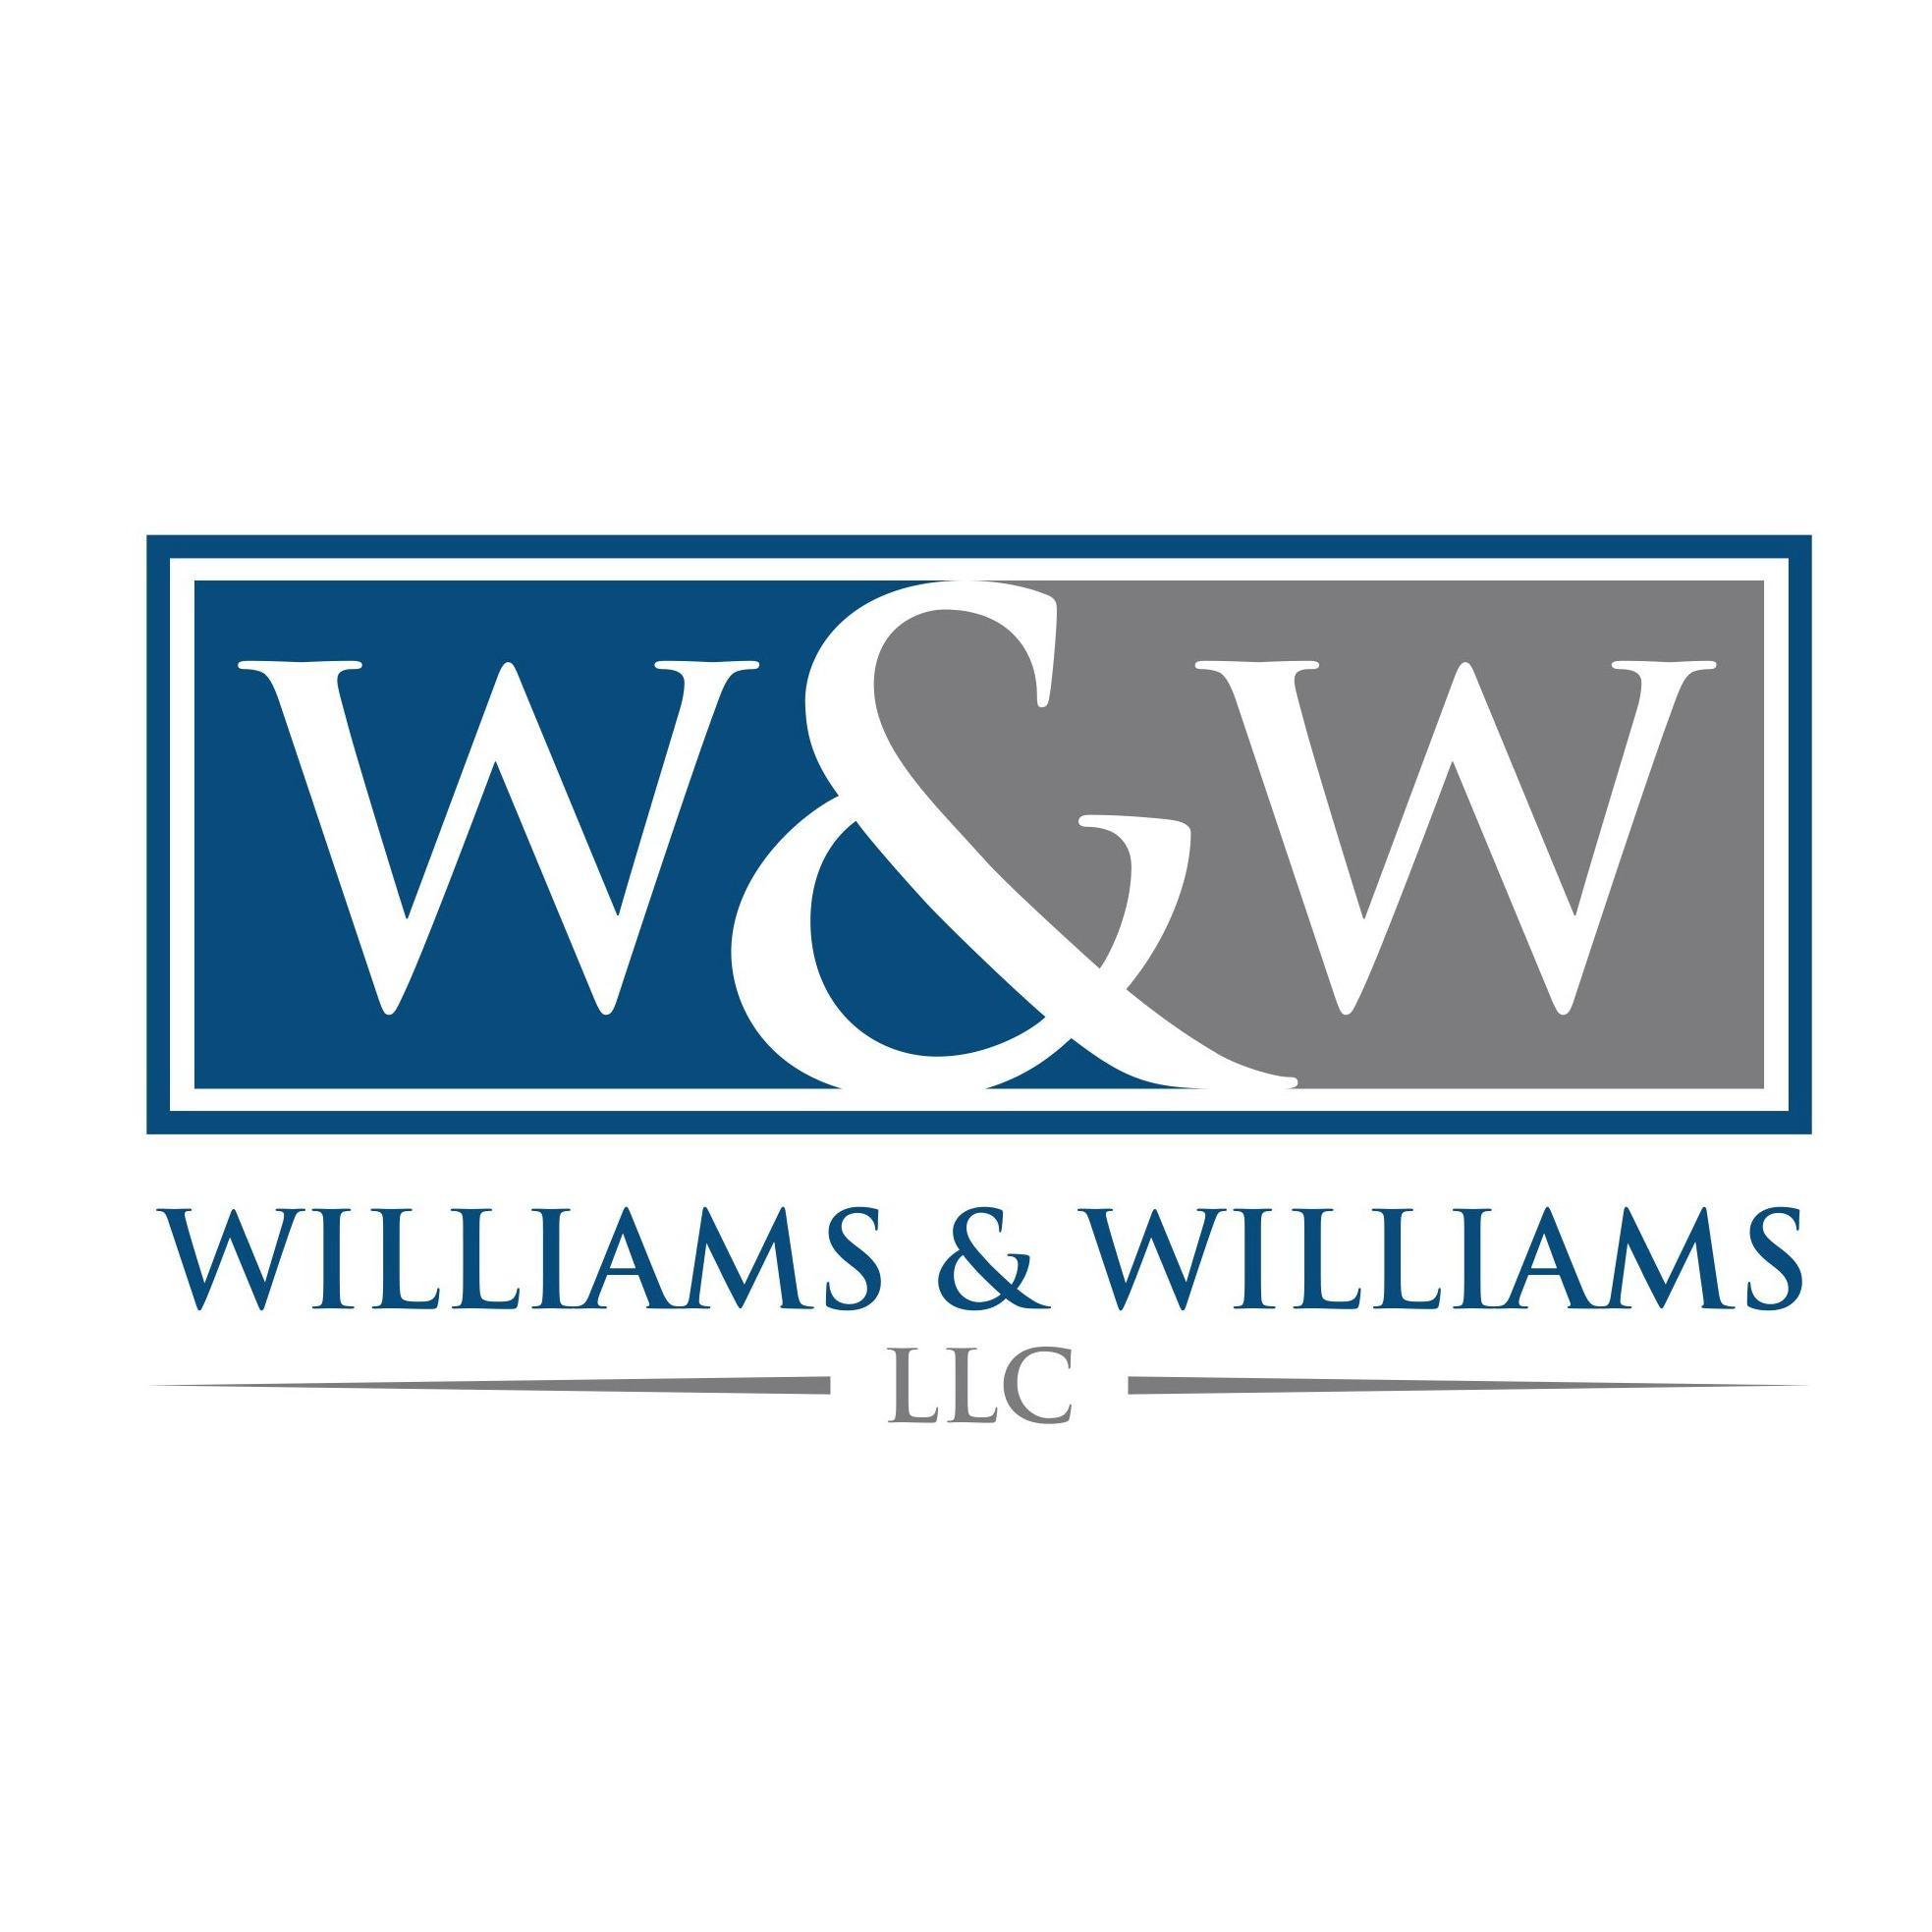 Williams & Williams Law, LLC